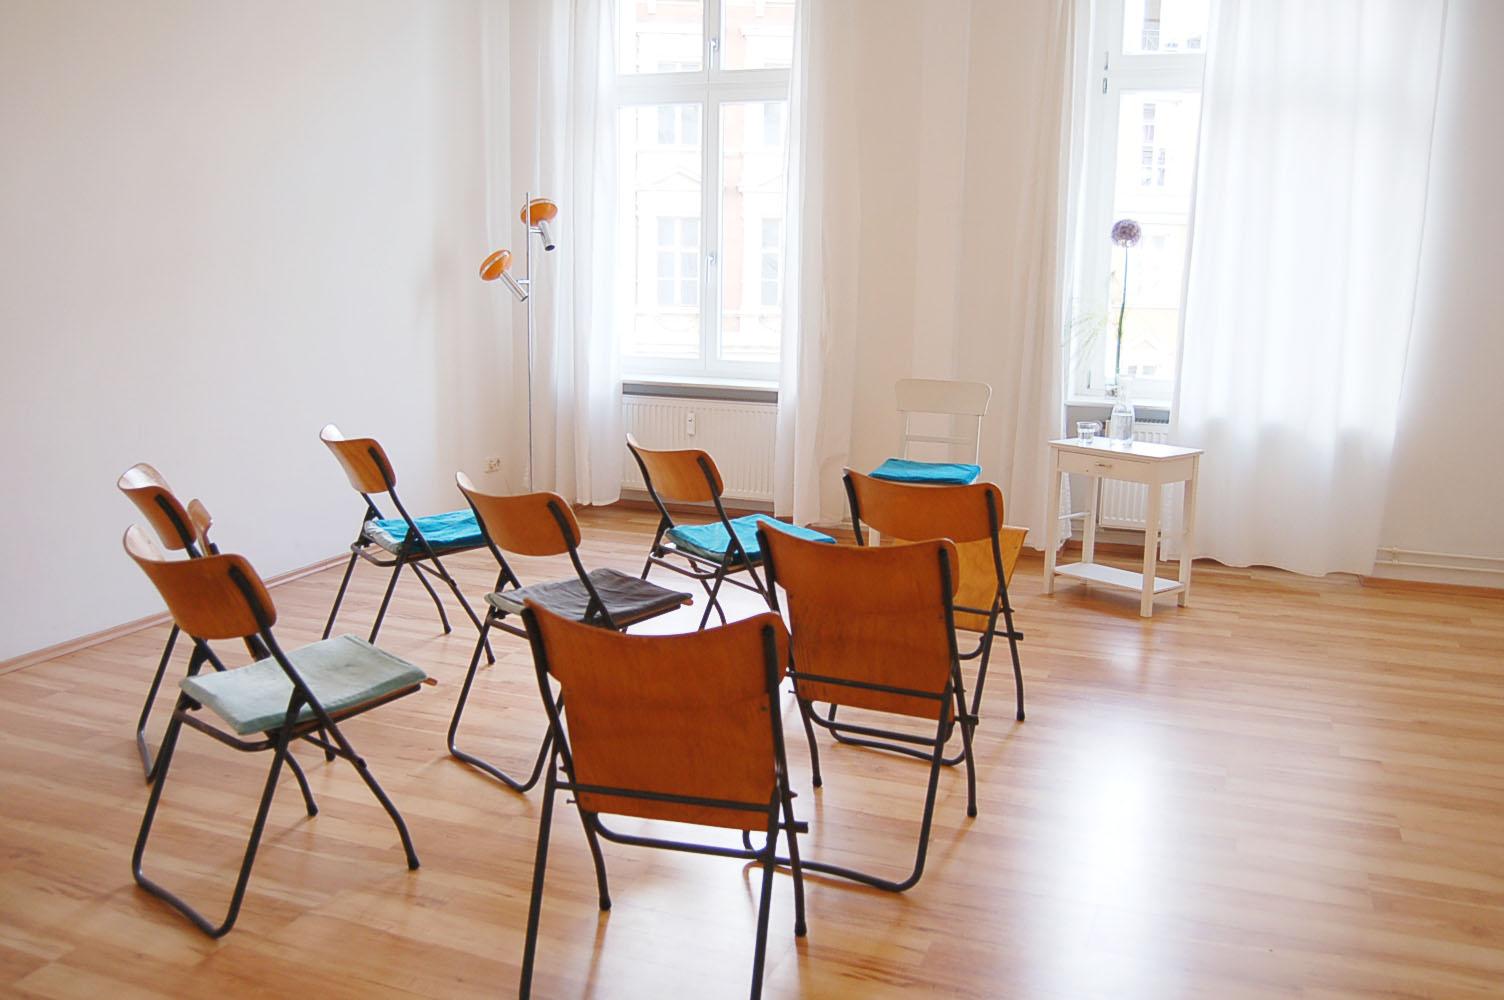 raumvermietung-tagungsräume-seminarräume-berlin-04